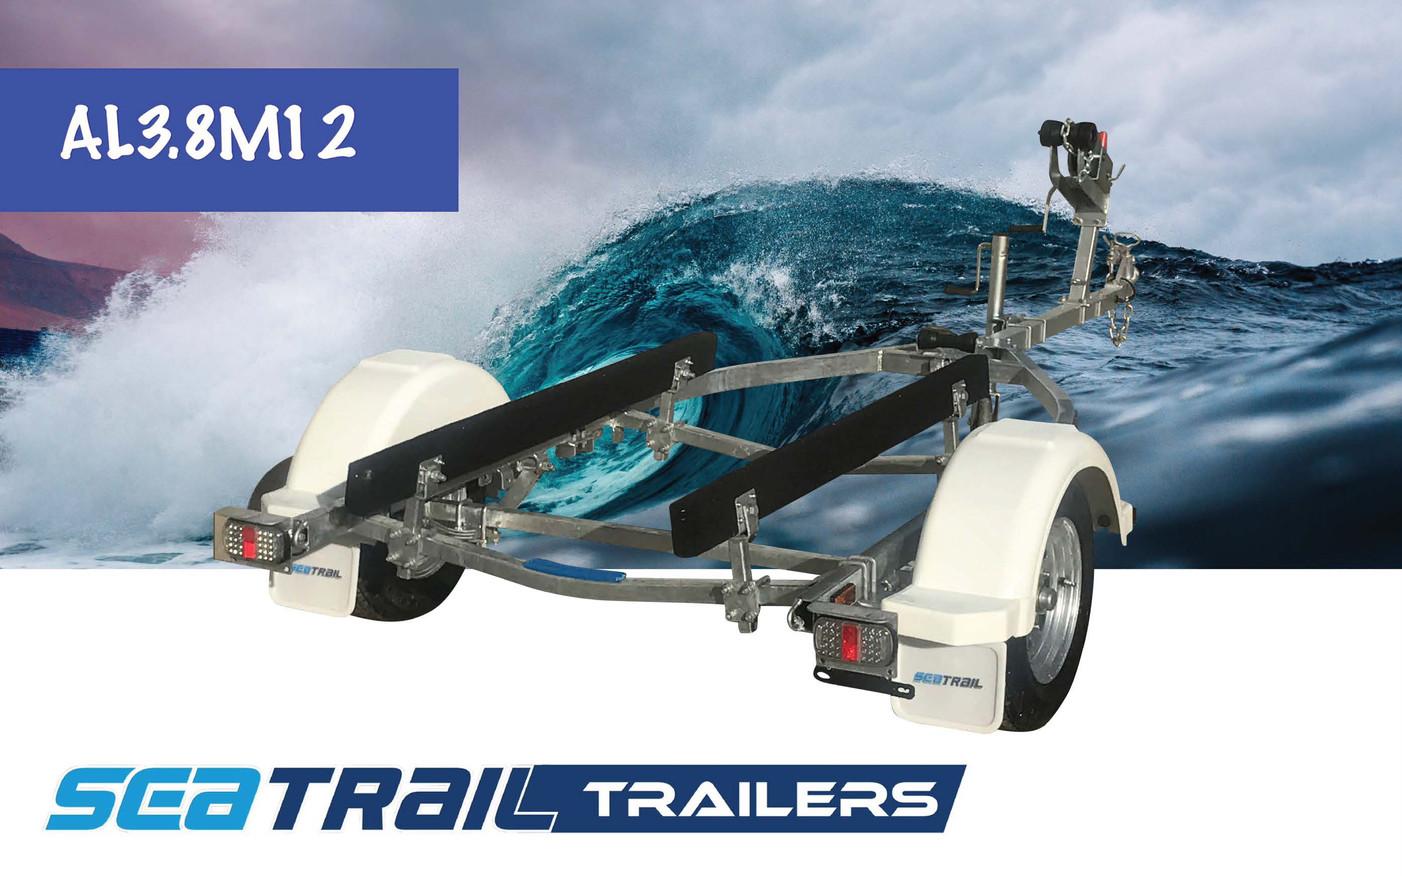 SEATRAIL AL3.8M12 SKID BOAT TRAILER